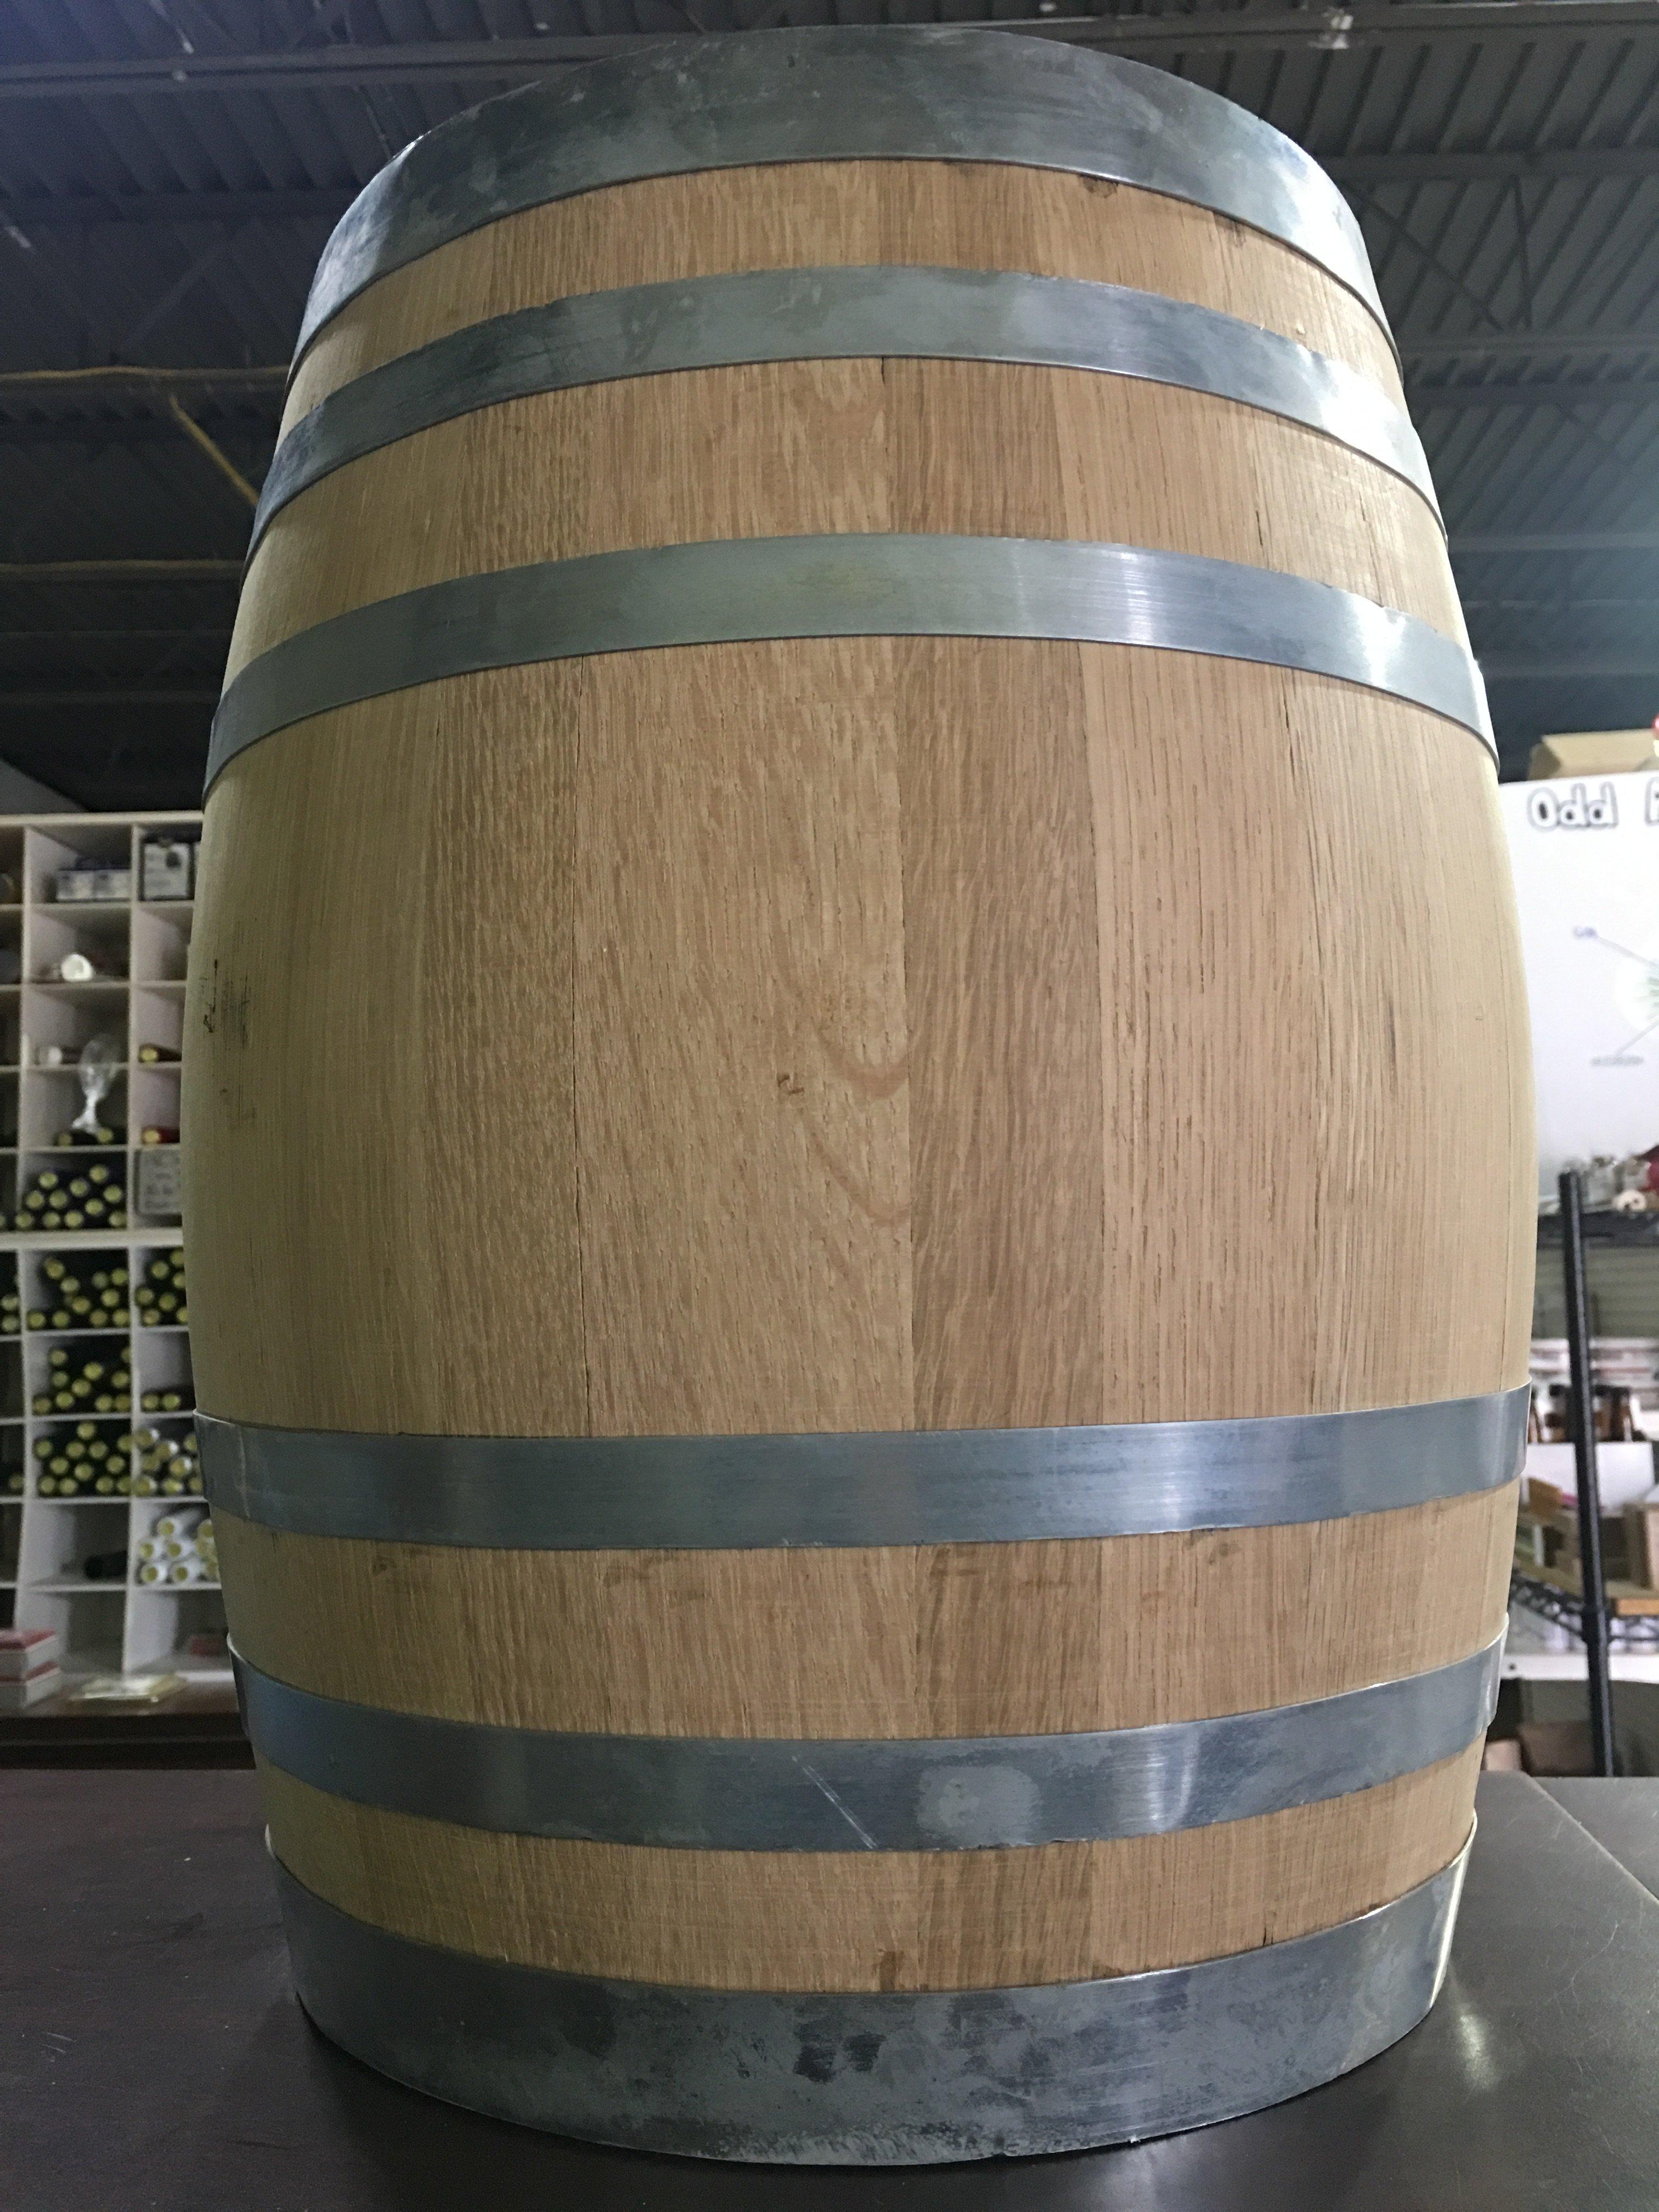 American Oak Barrel 5 gallon